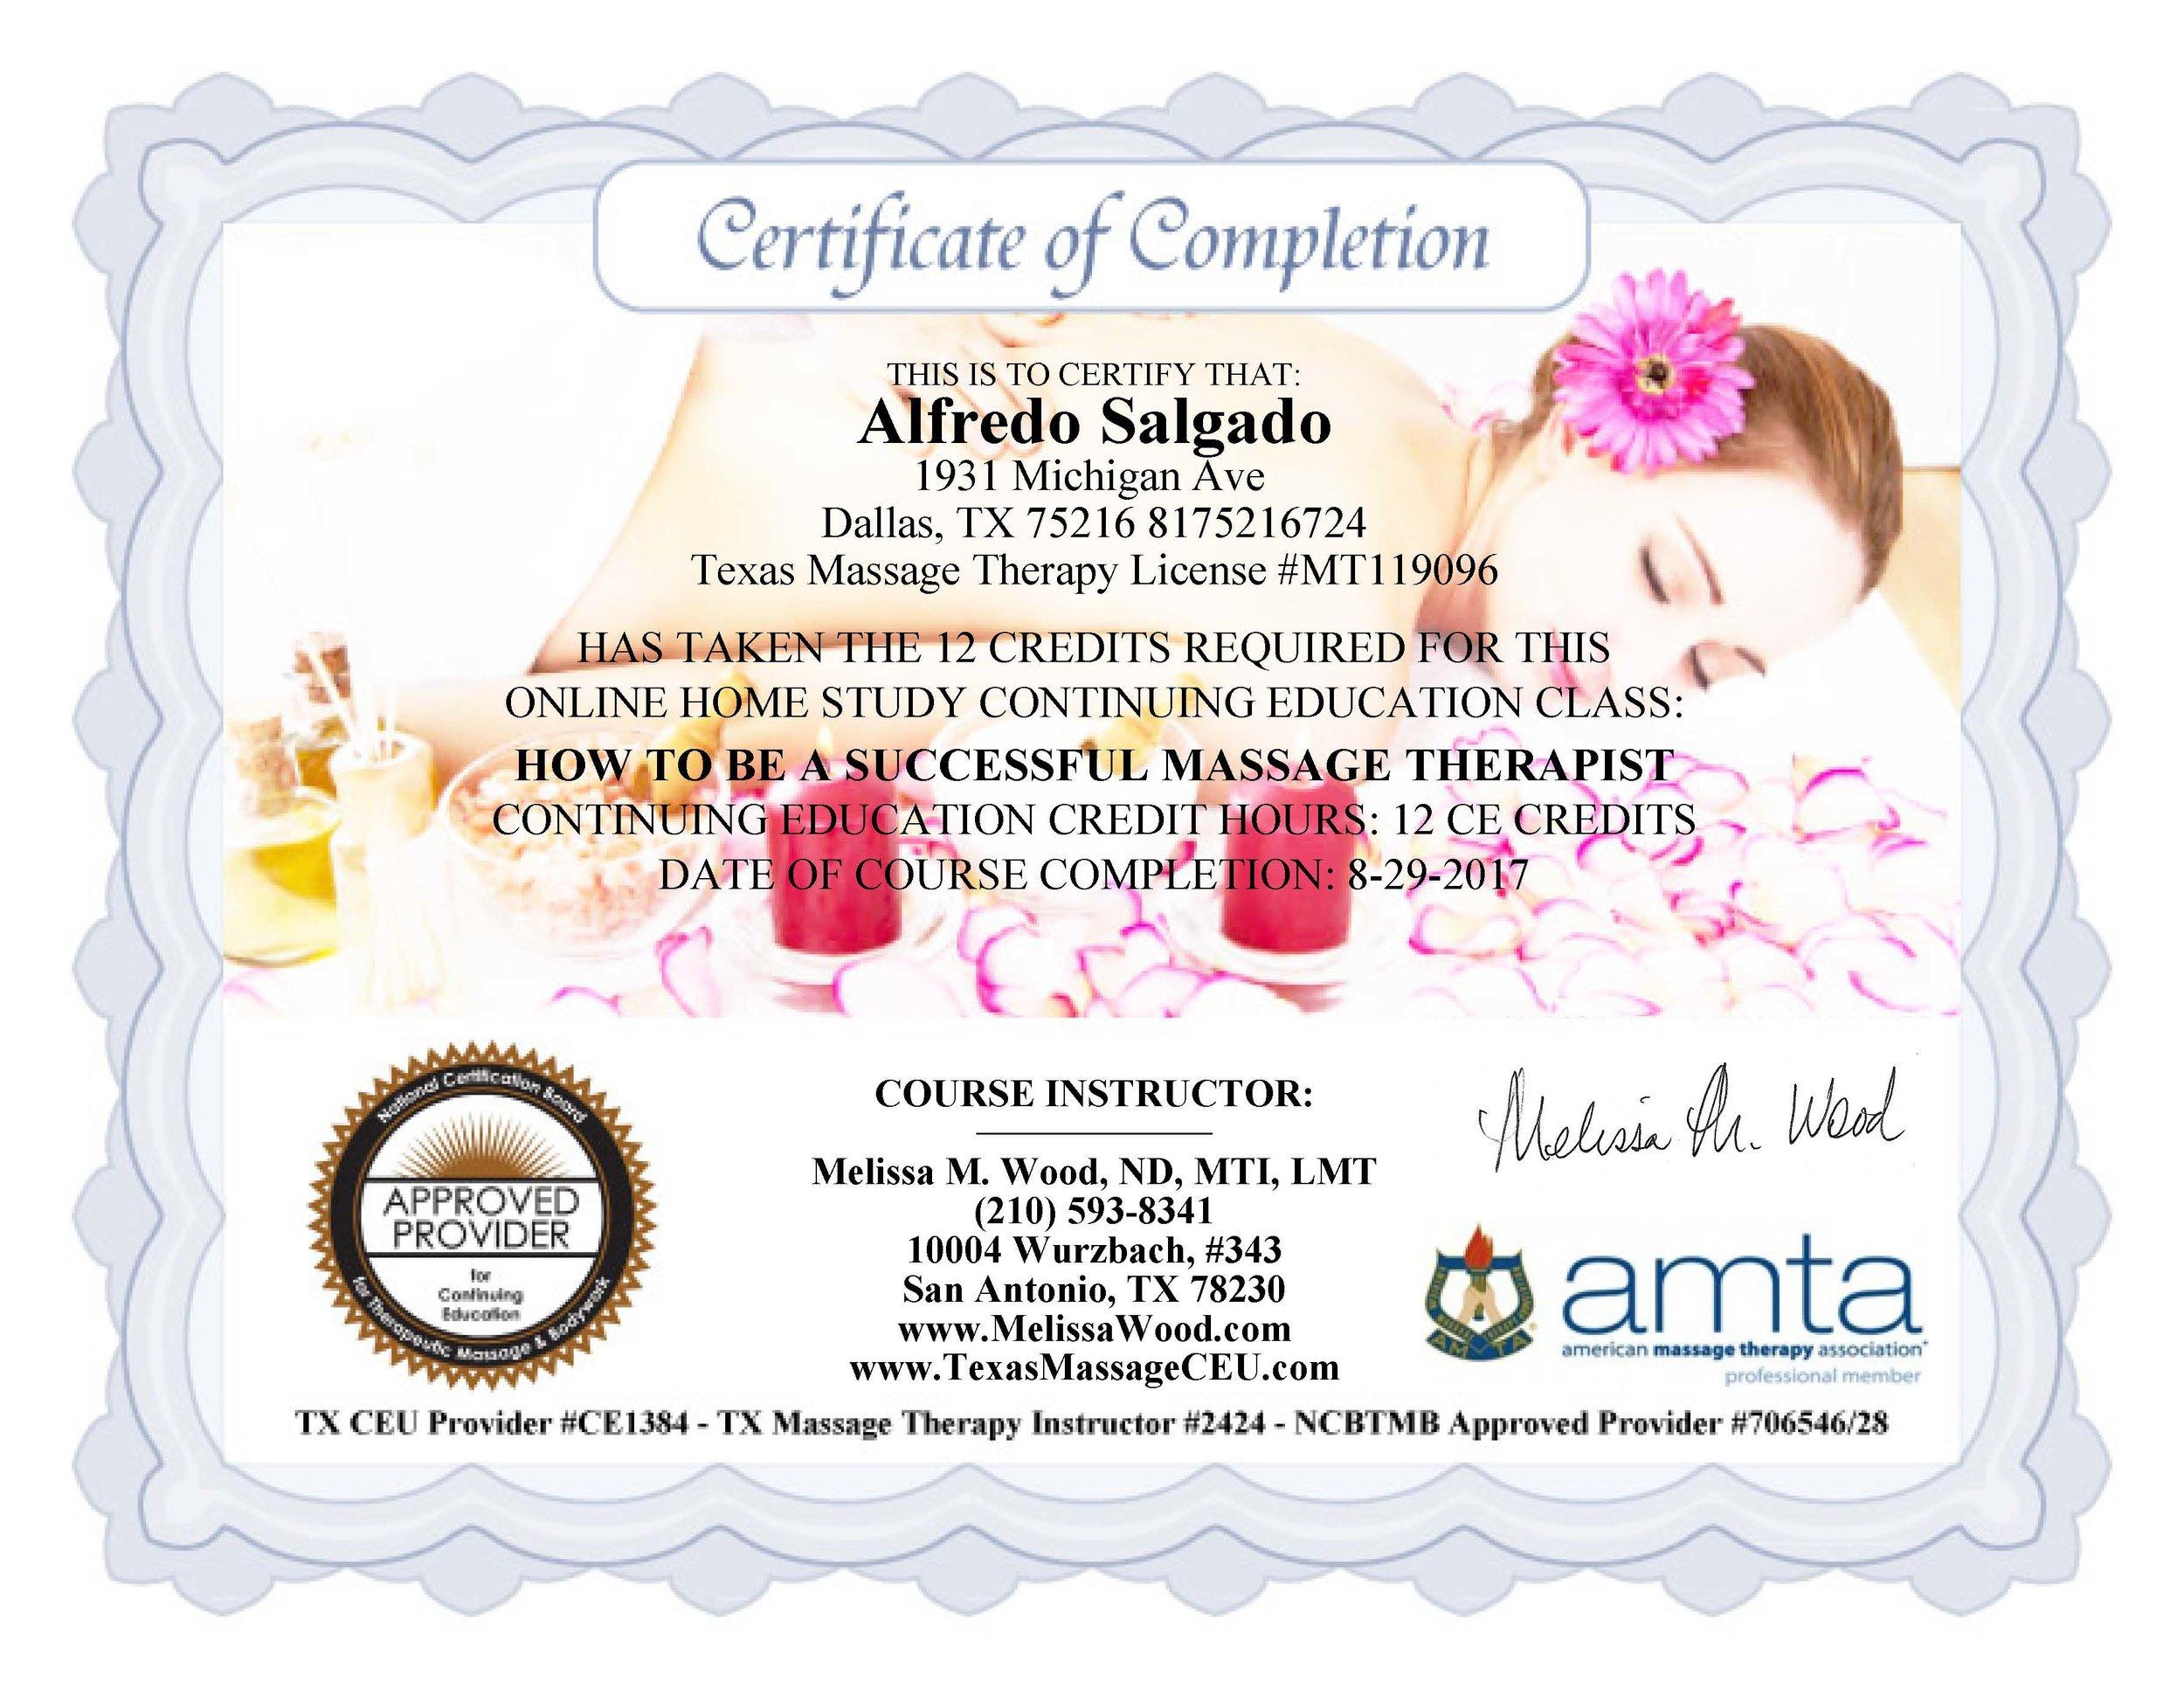 Certification_AlfredoSalgado-275611.jpg